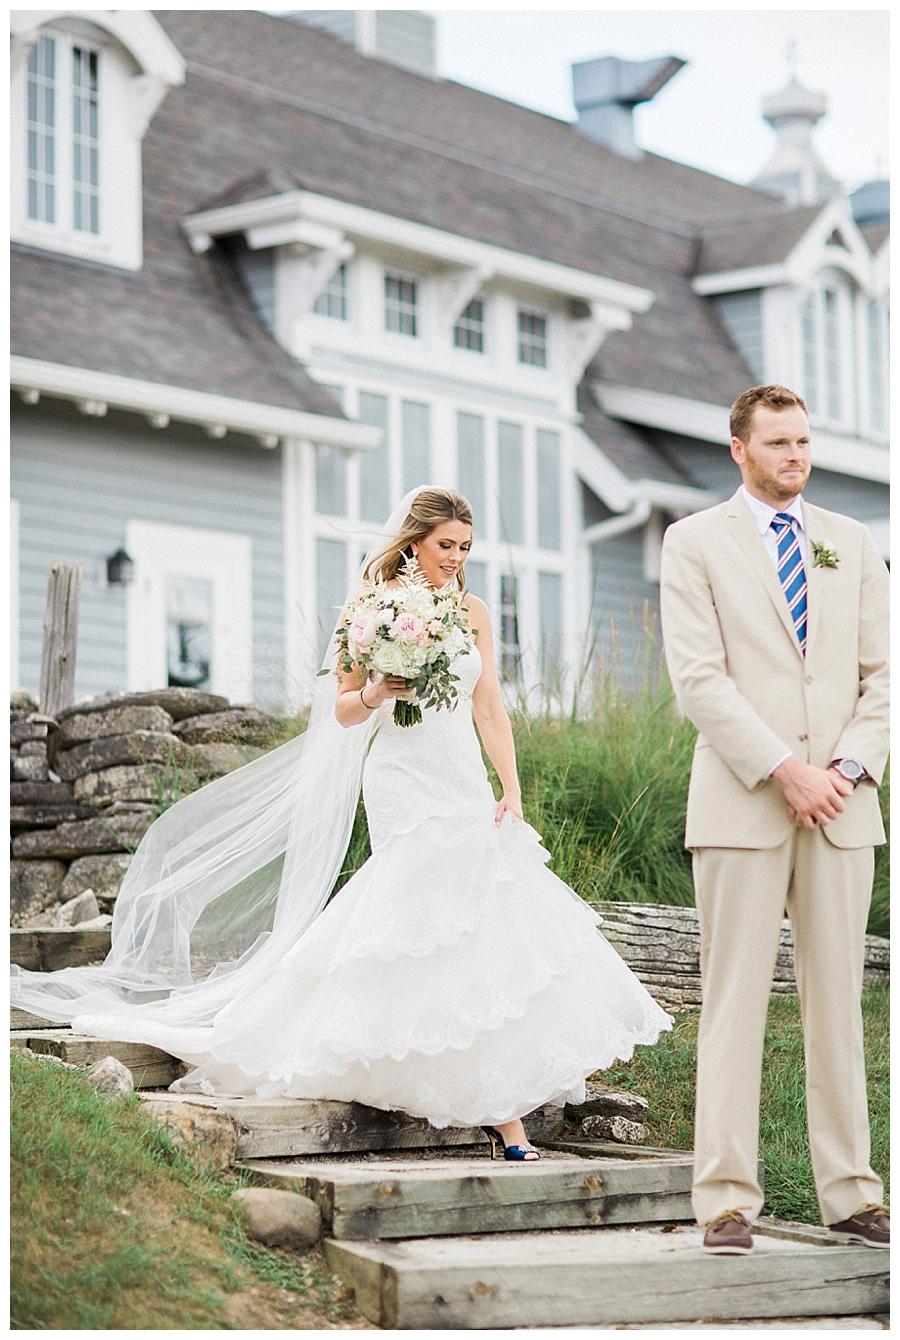 fine art wedding photography at Horseshoe Bay Golf Club in Door County, Wisconsin